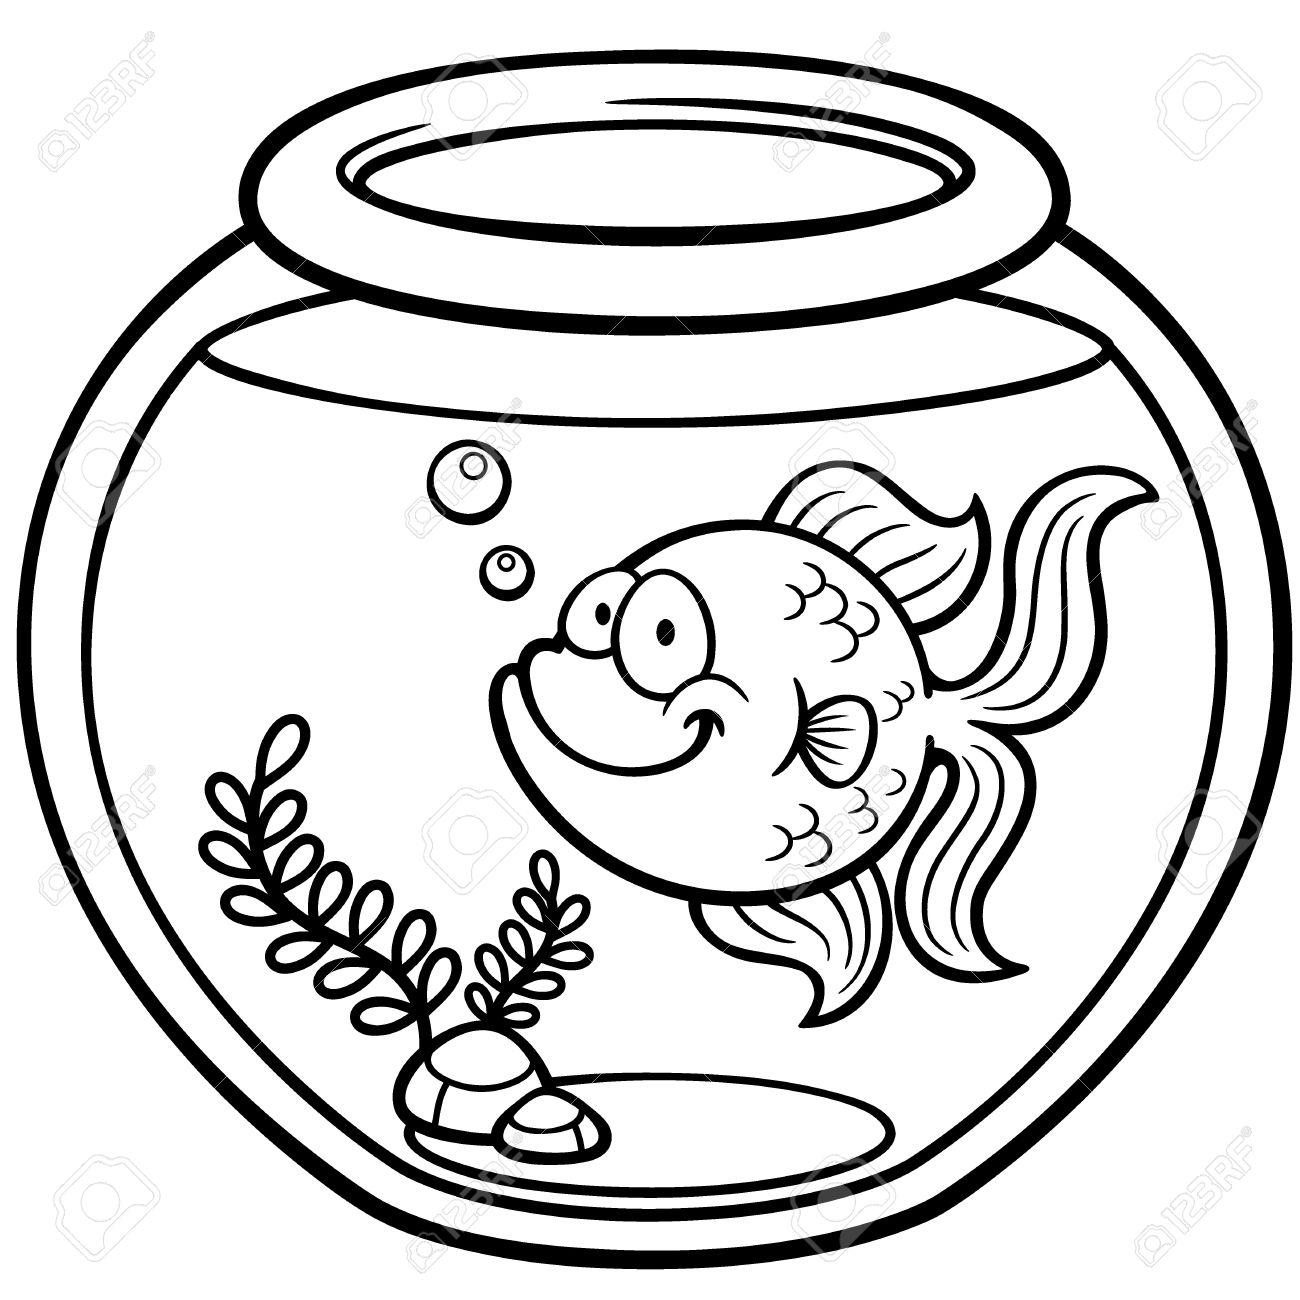 1300x1300 Goldfish Clipart Bowl Drawing